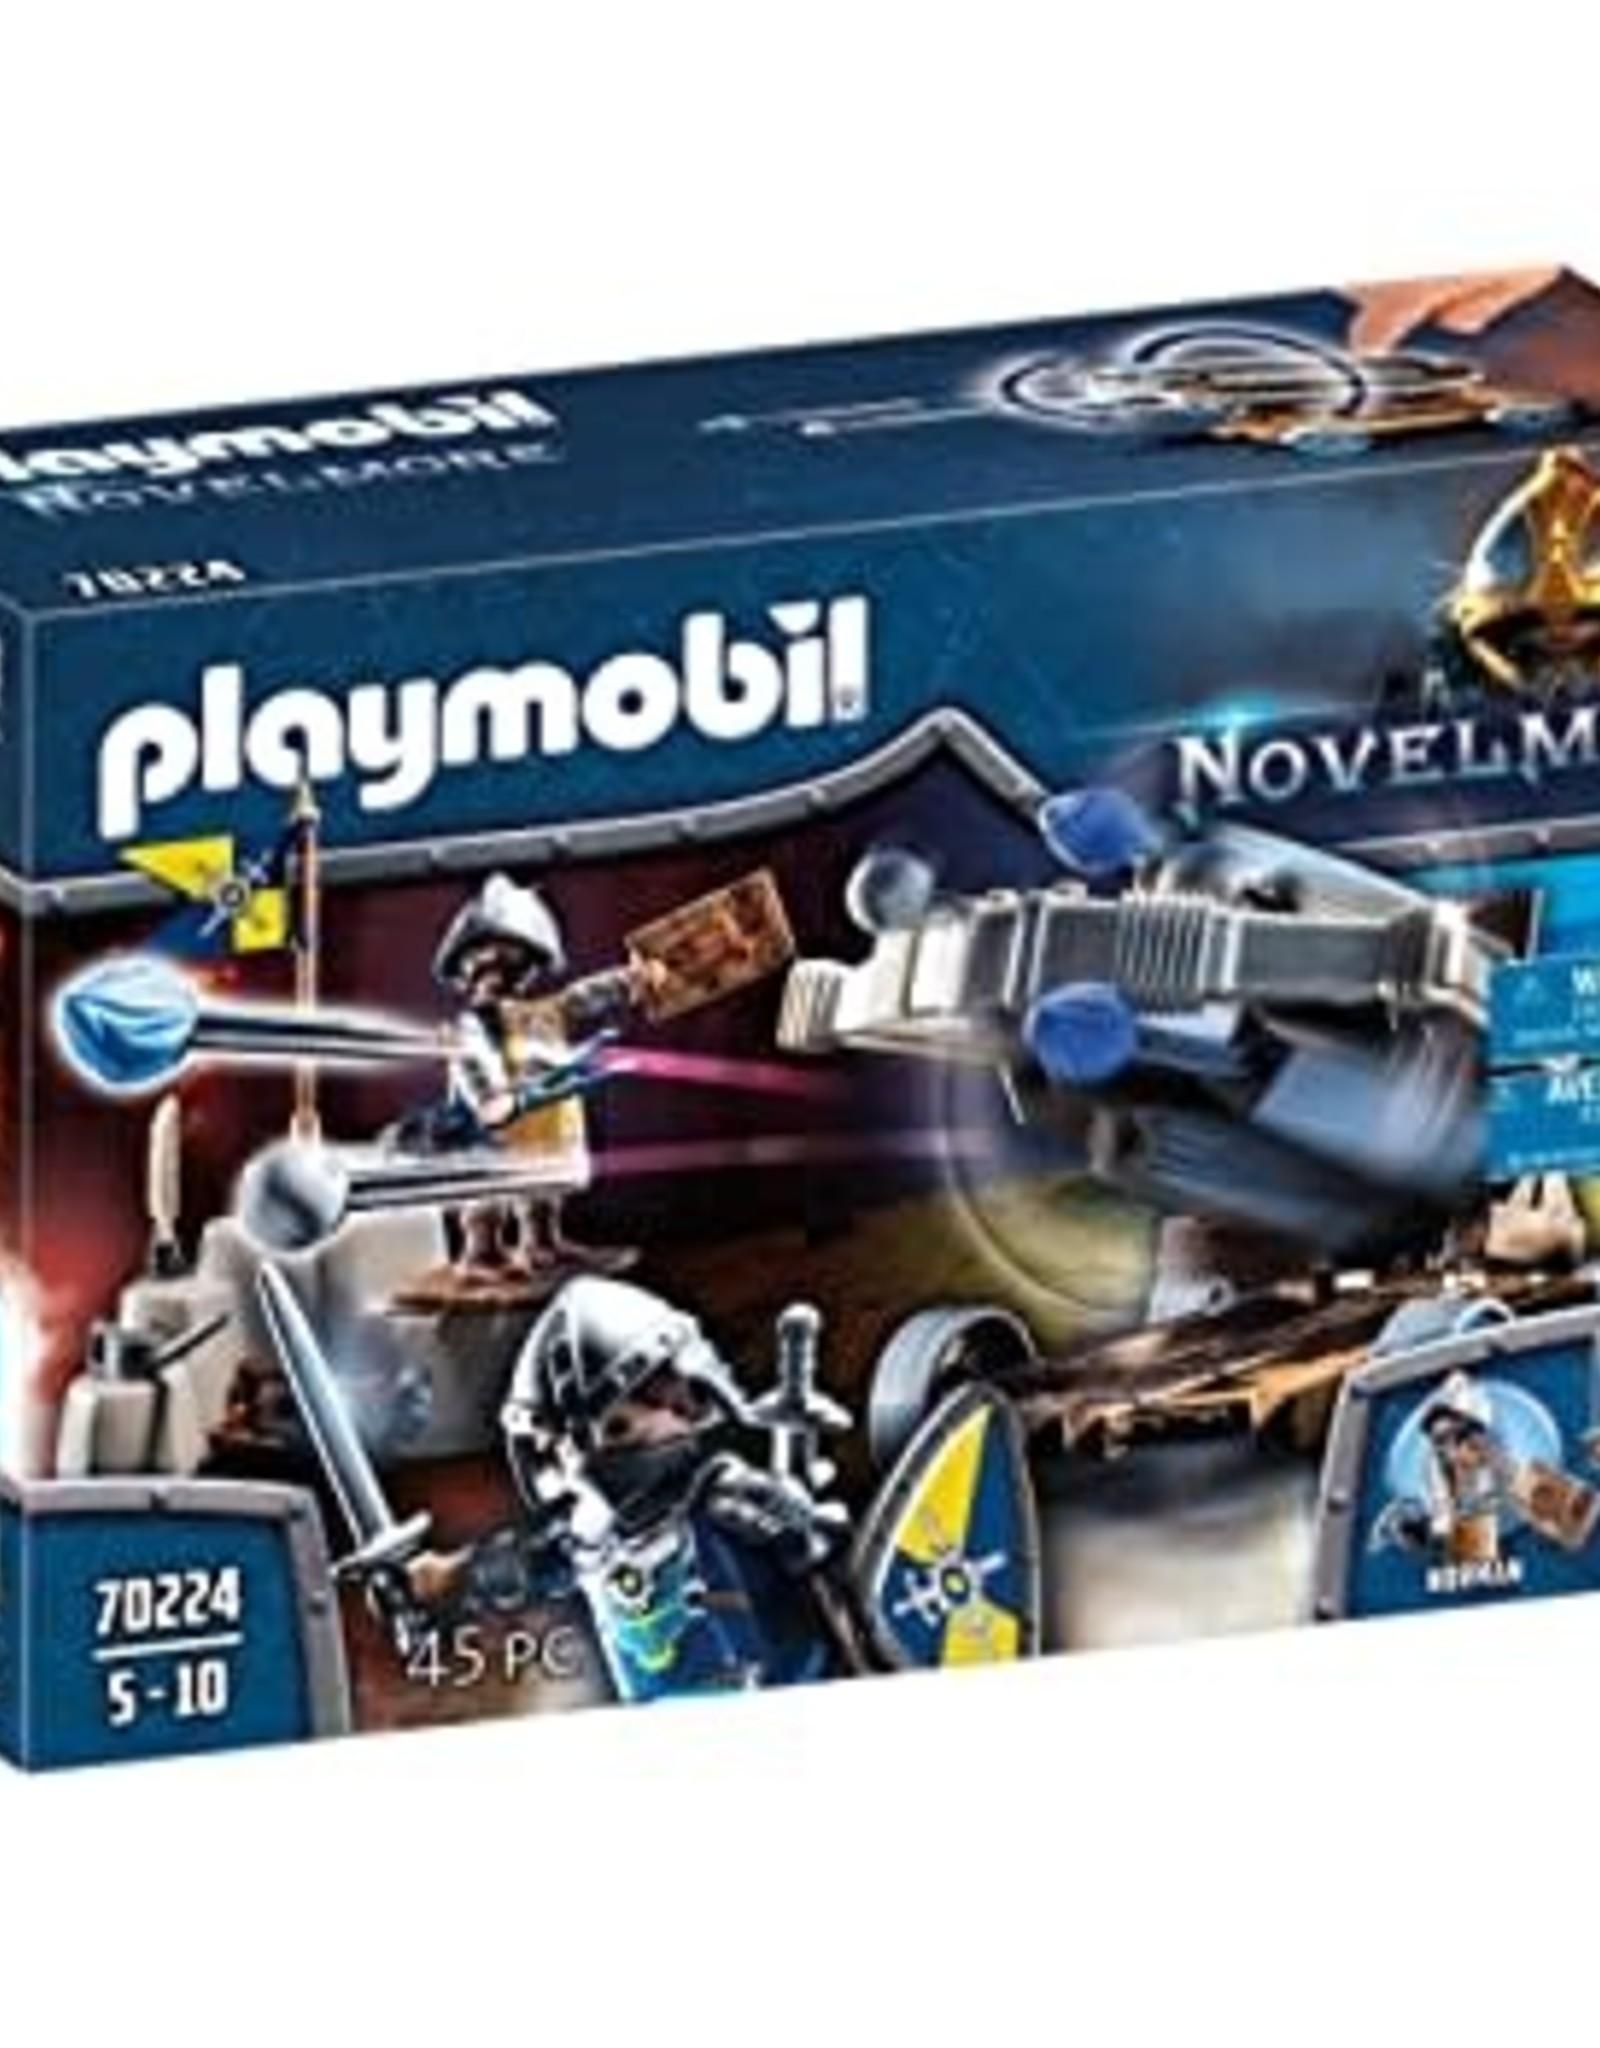 Playmobil PM Novelmore Water Ballista